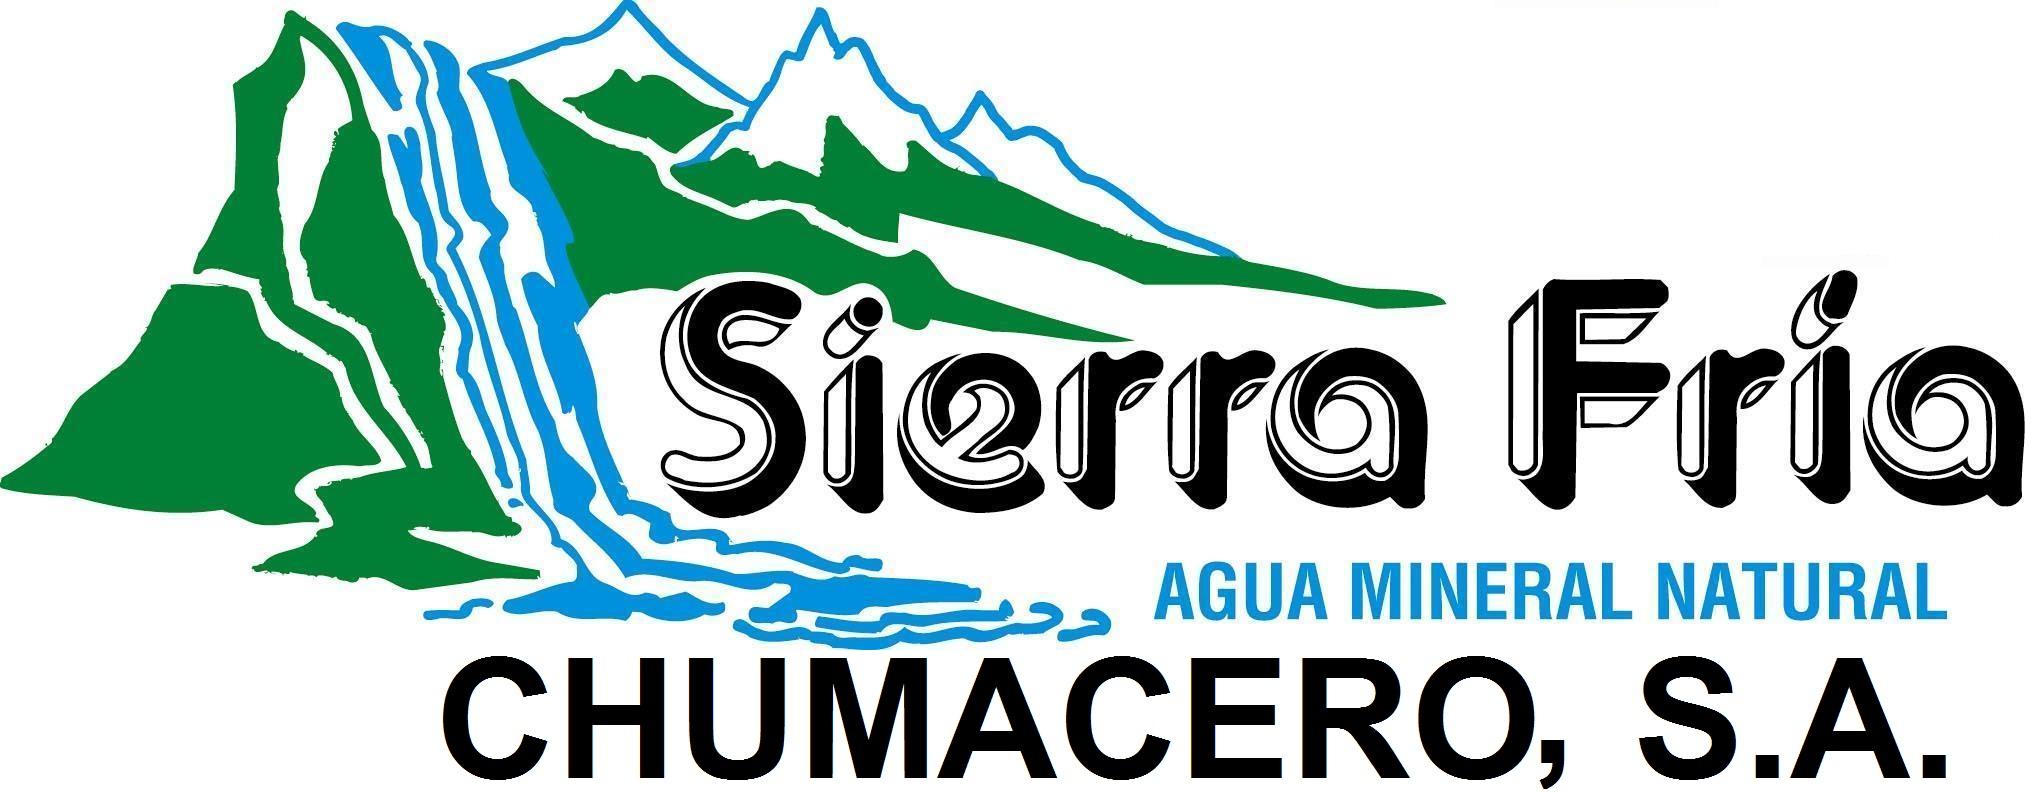 801667-logo_sierrafria_2